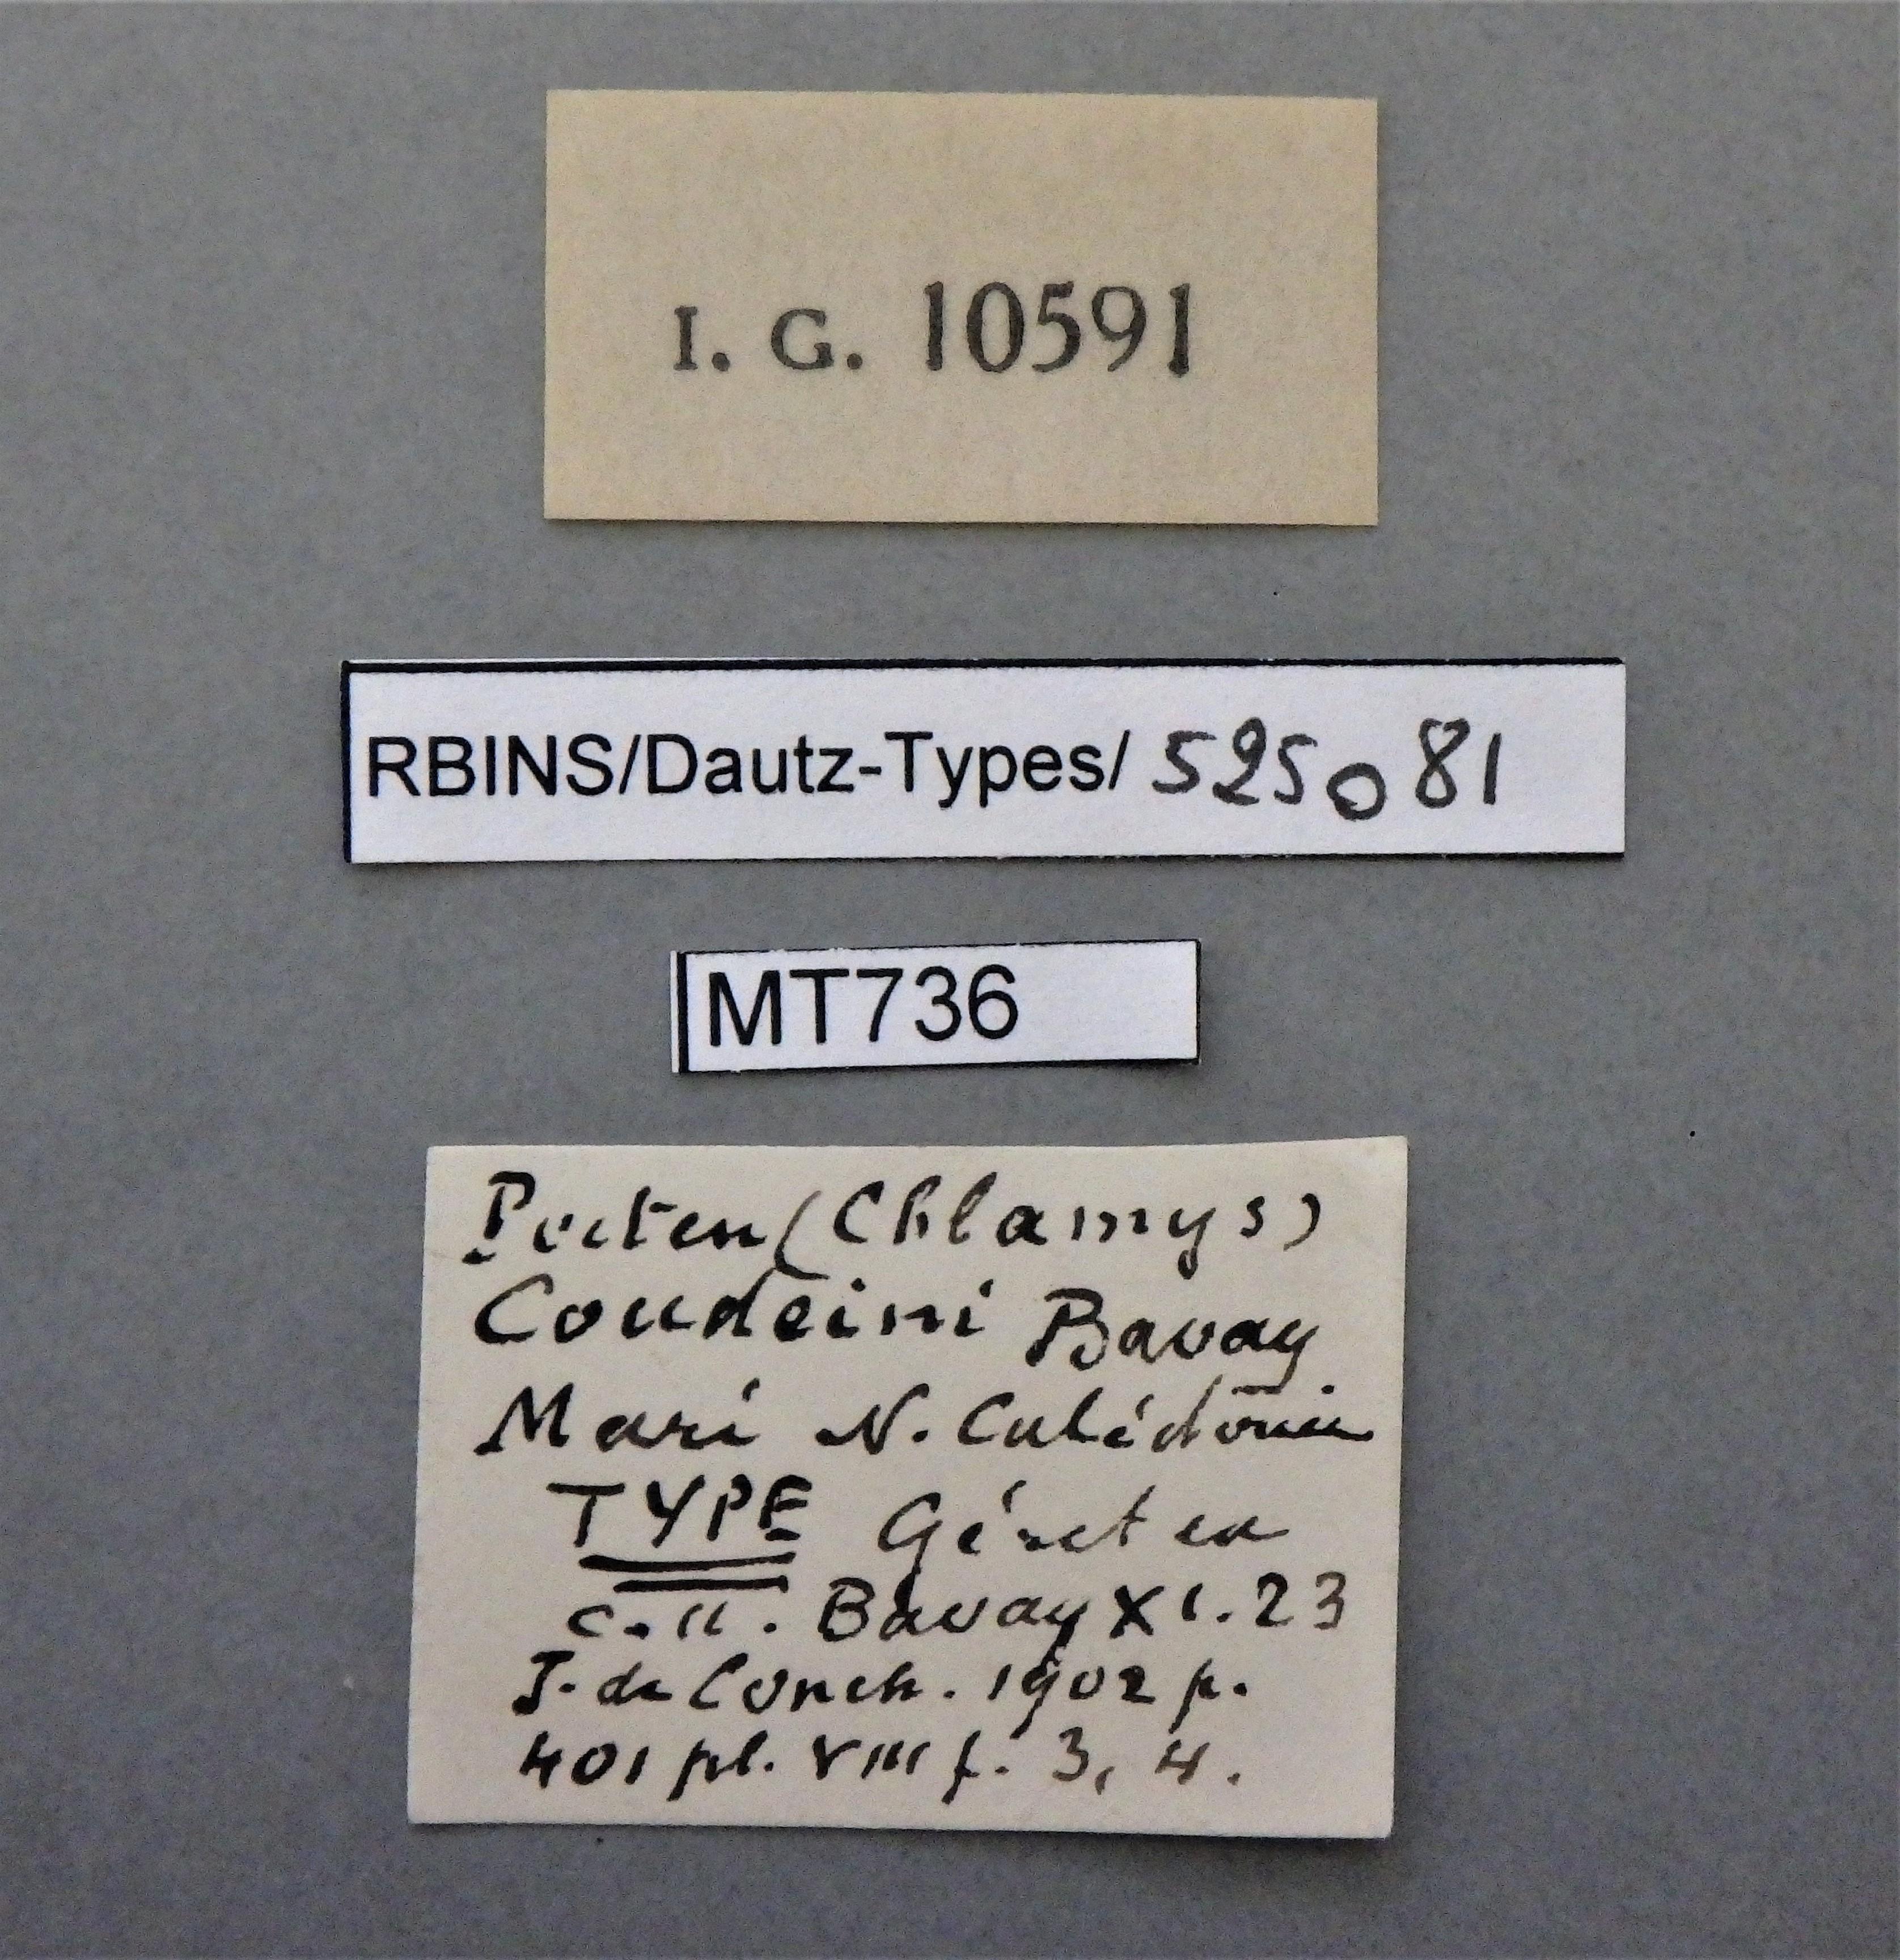 BE-RBINS-INV MT 736 Pecten (Chlamys) coudeini t Lb.jpg